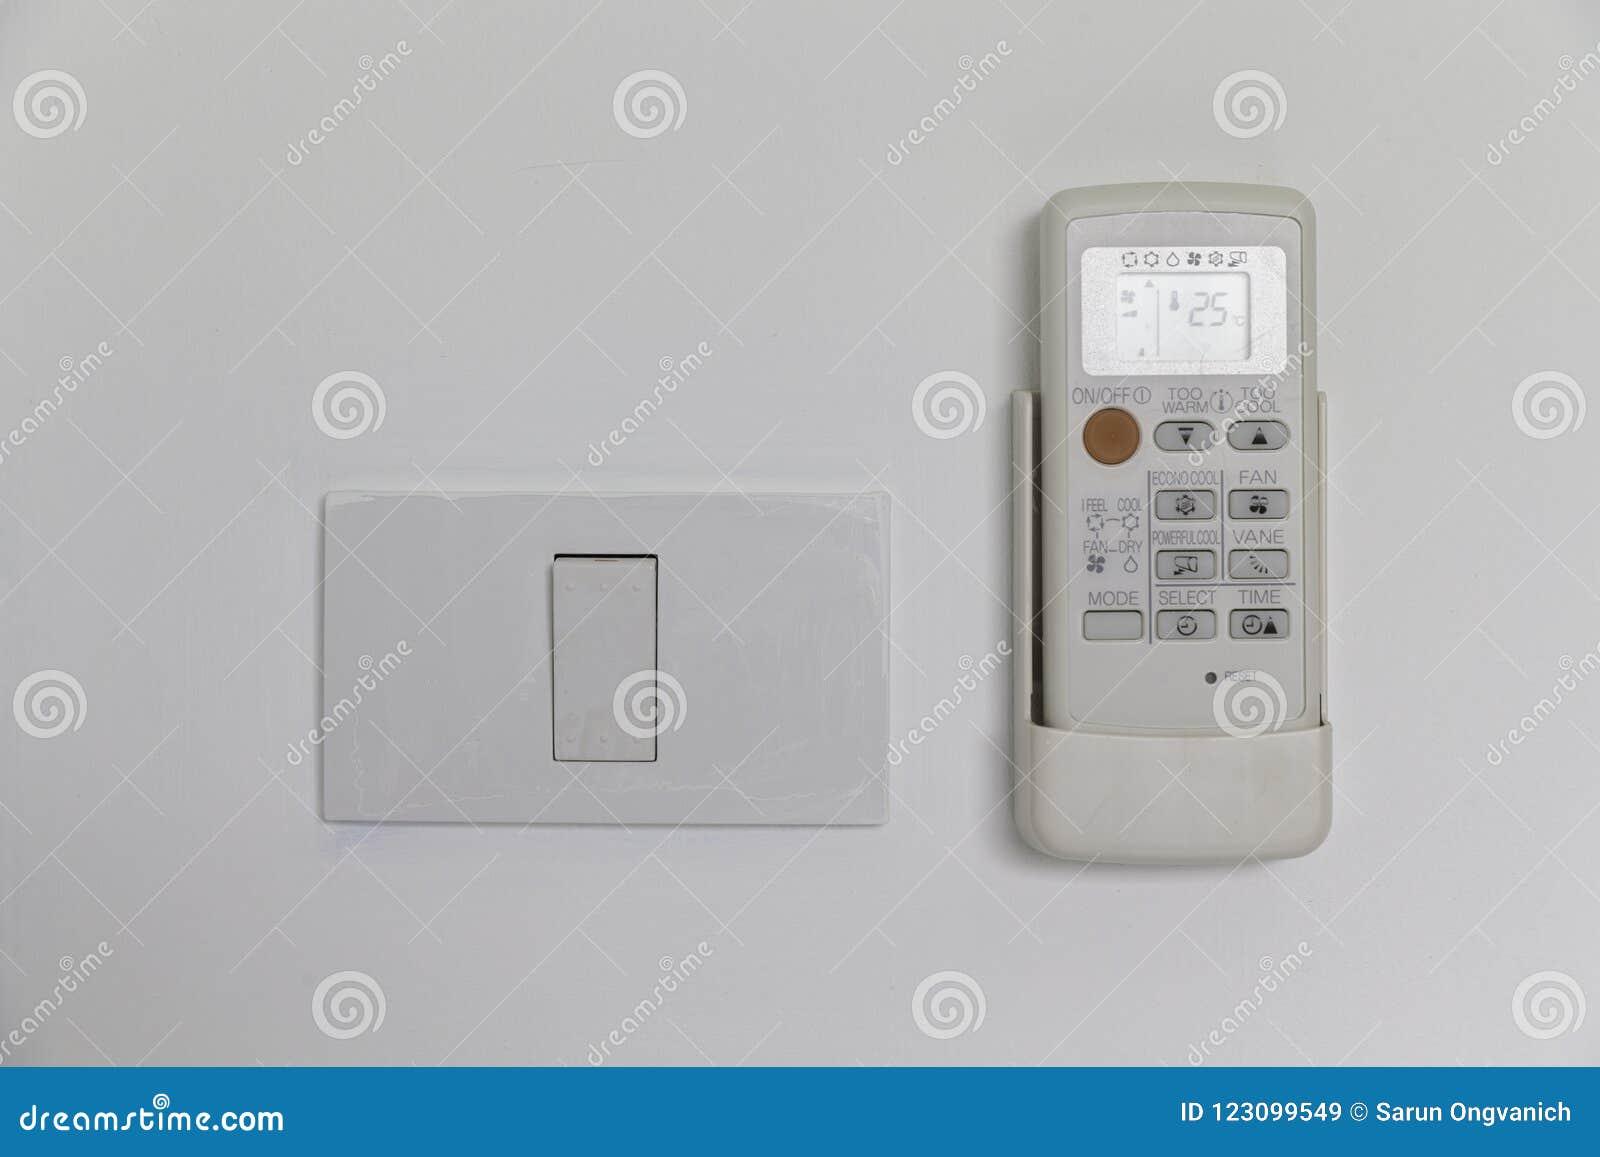 Controlo a distância do condicionador de ar e do interruptor da luz